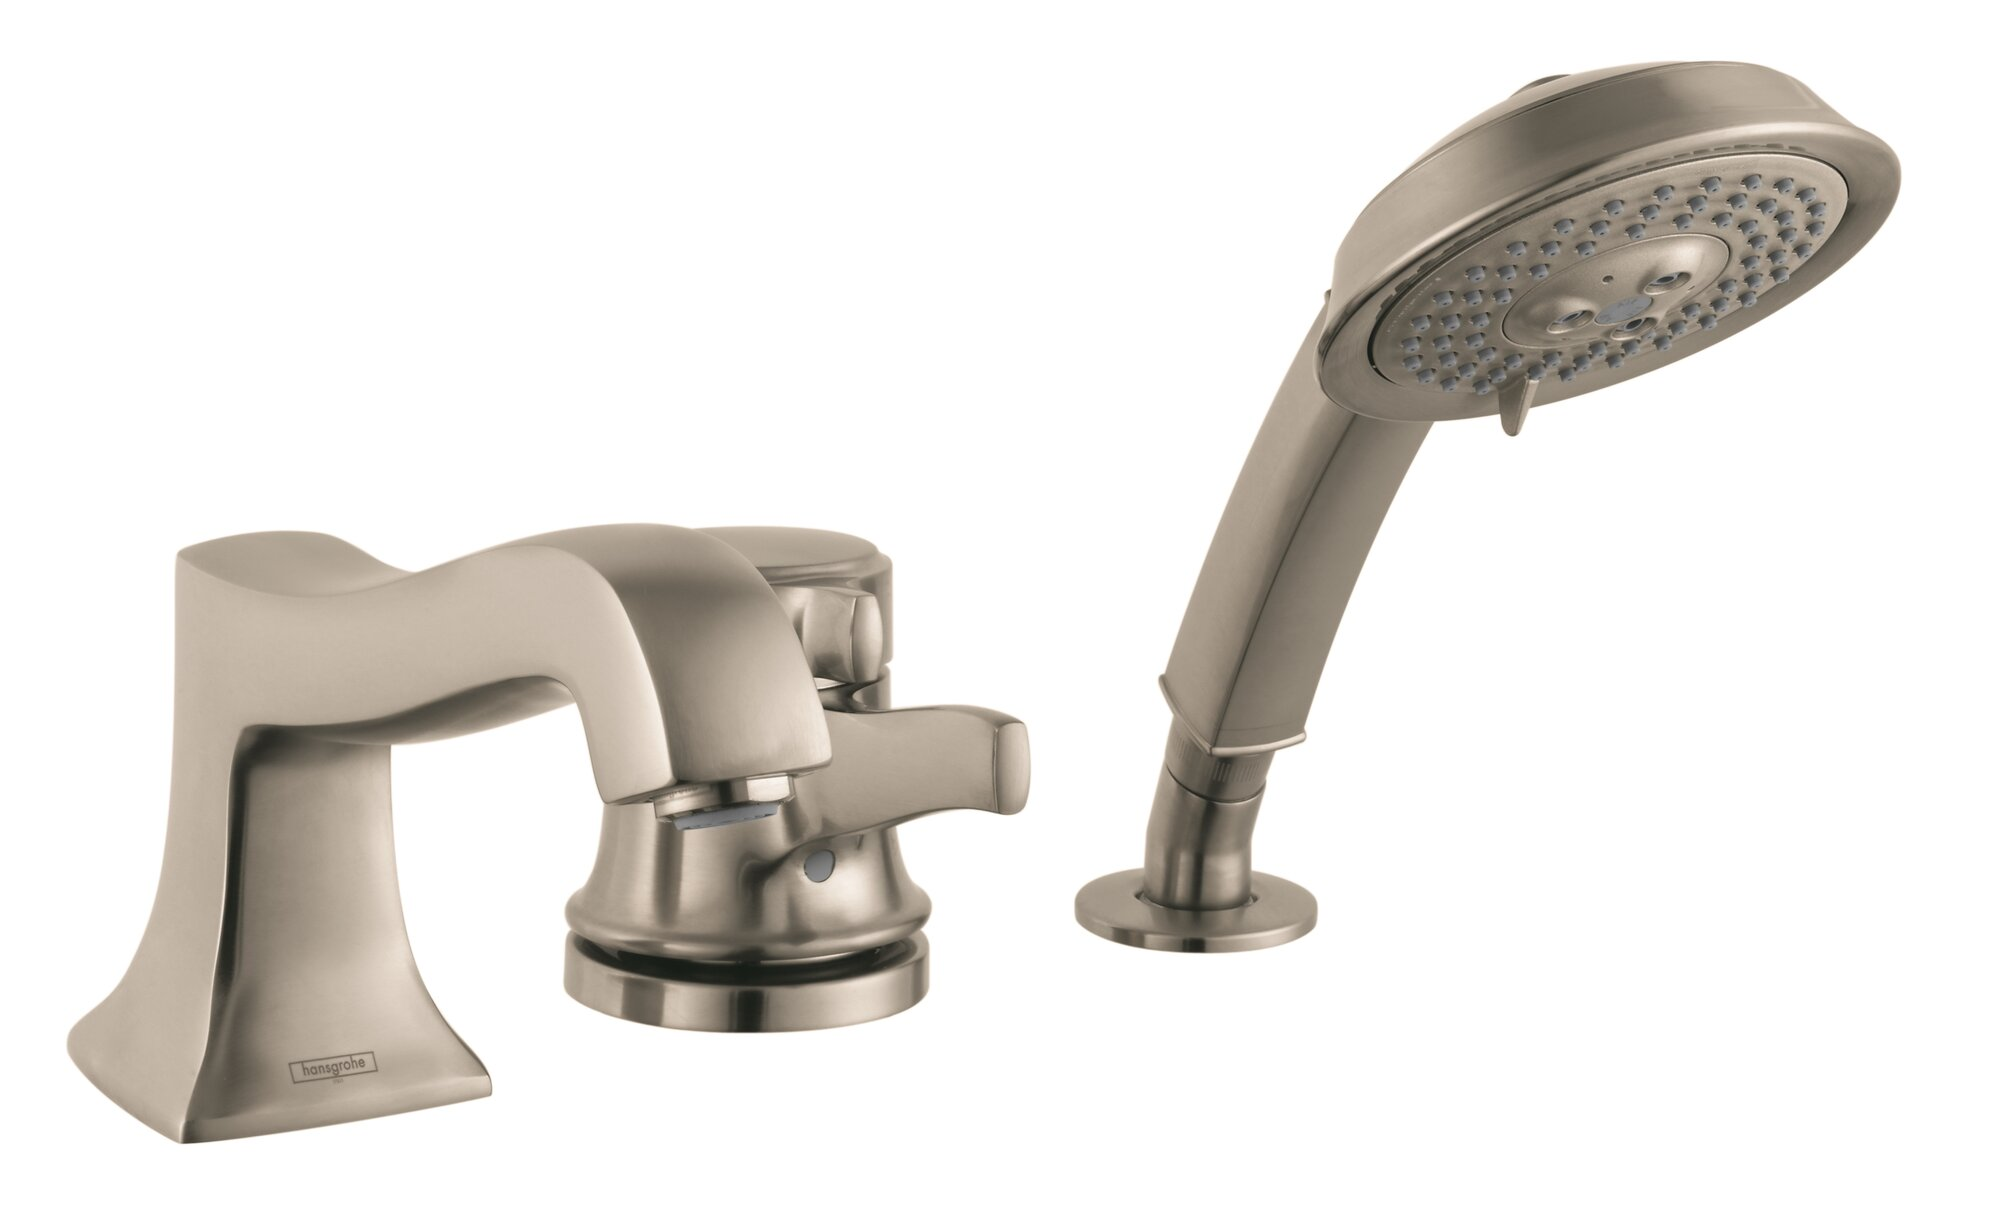 Metris C Single Handle Deck Mounted Roman Tub Faucet Trim With Hand Shower